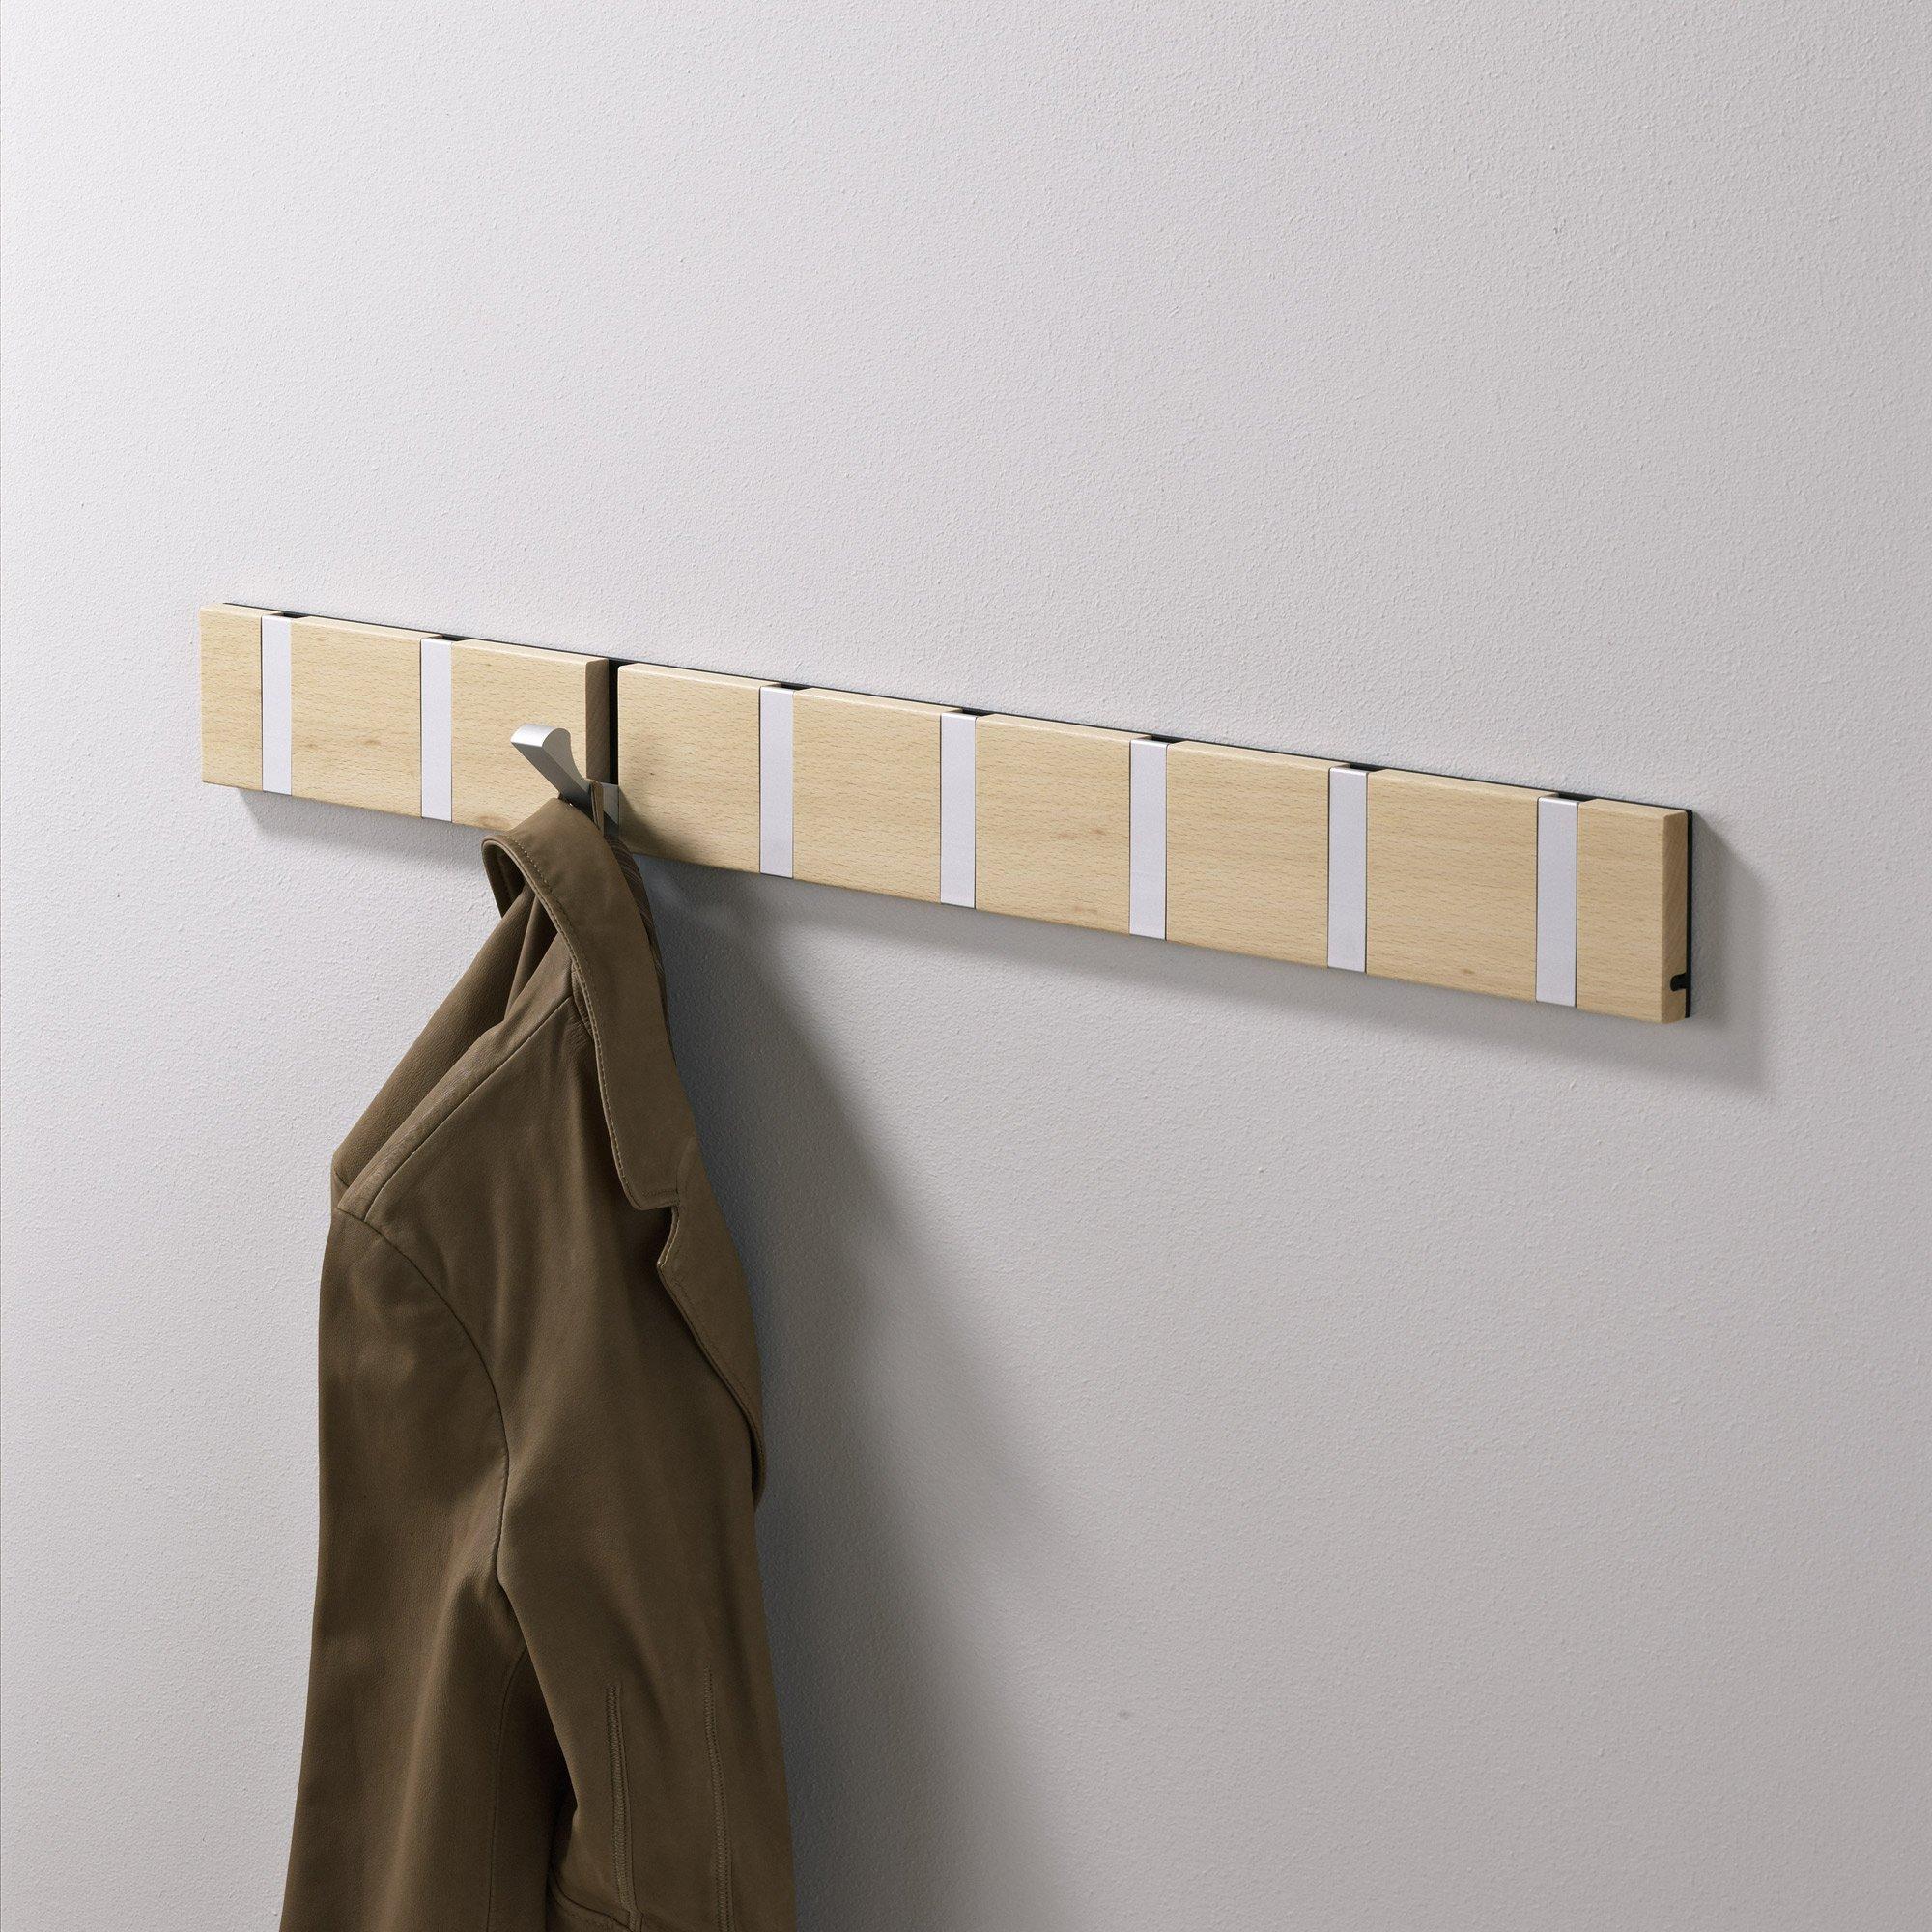 Knax 8 horizontal hooks